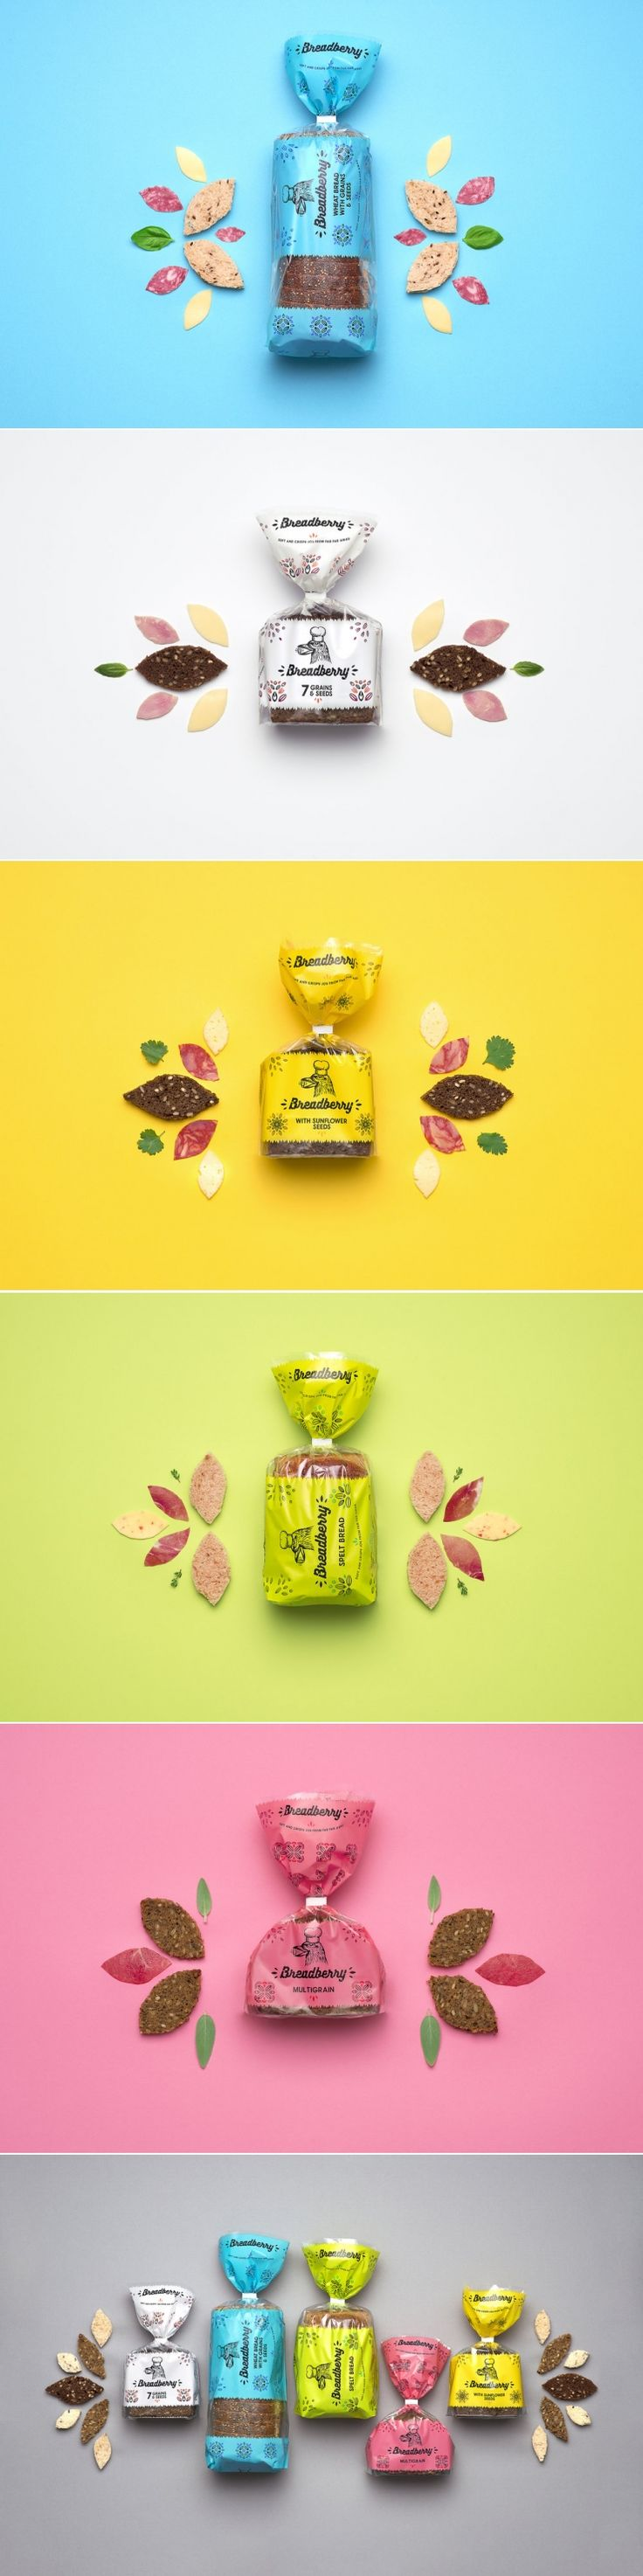 Breadberry. The bread from far far away. — The Dieline - Branding & Packaging Design